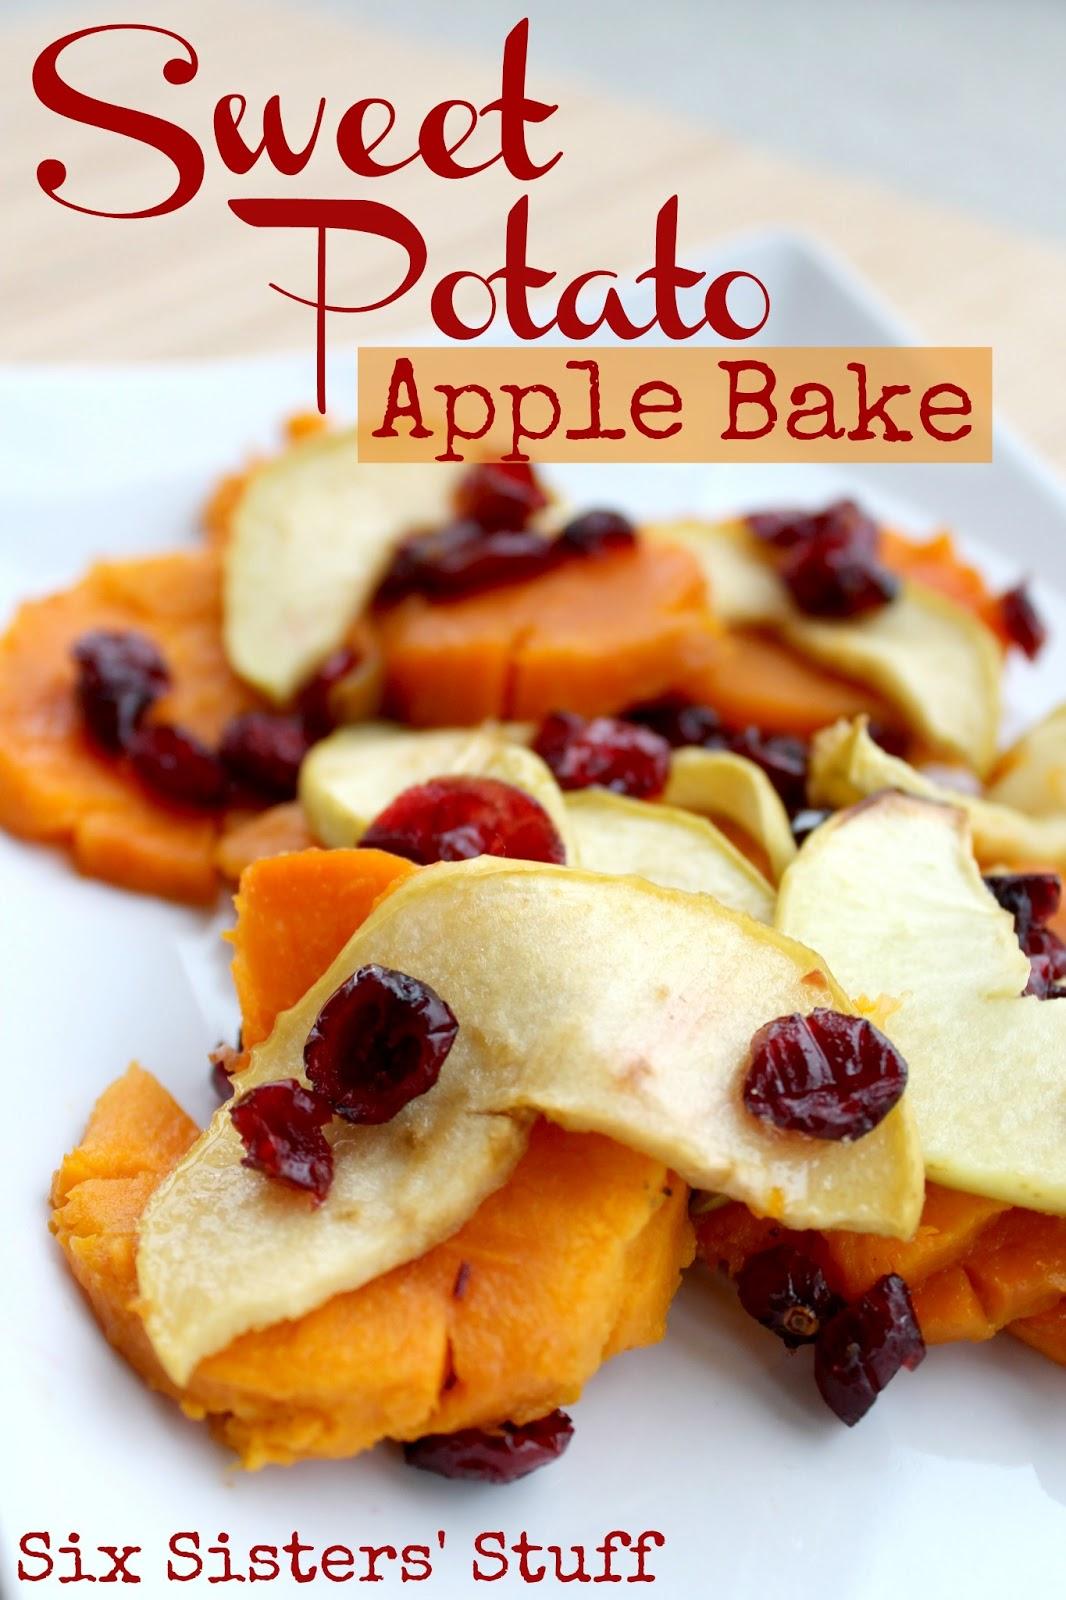 Sweet Potato Apple Bake | Six Sisters' Stuff